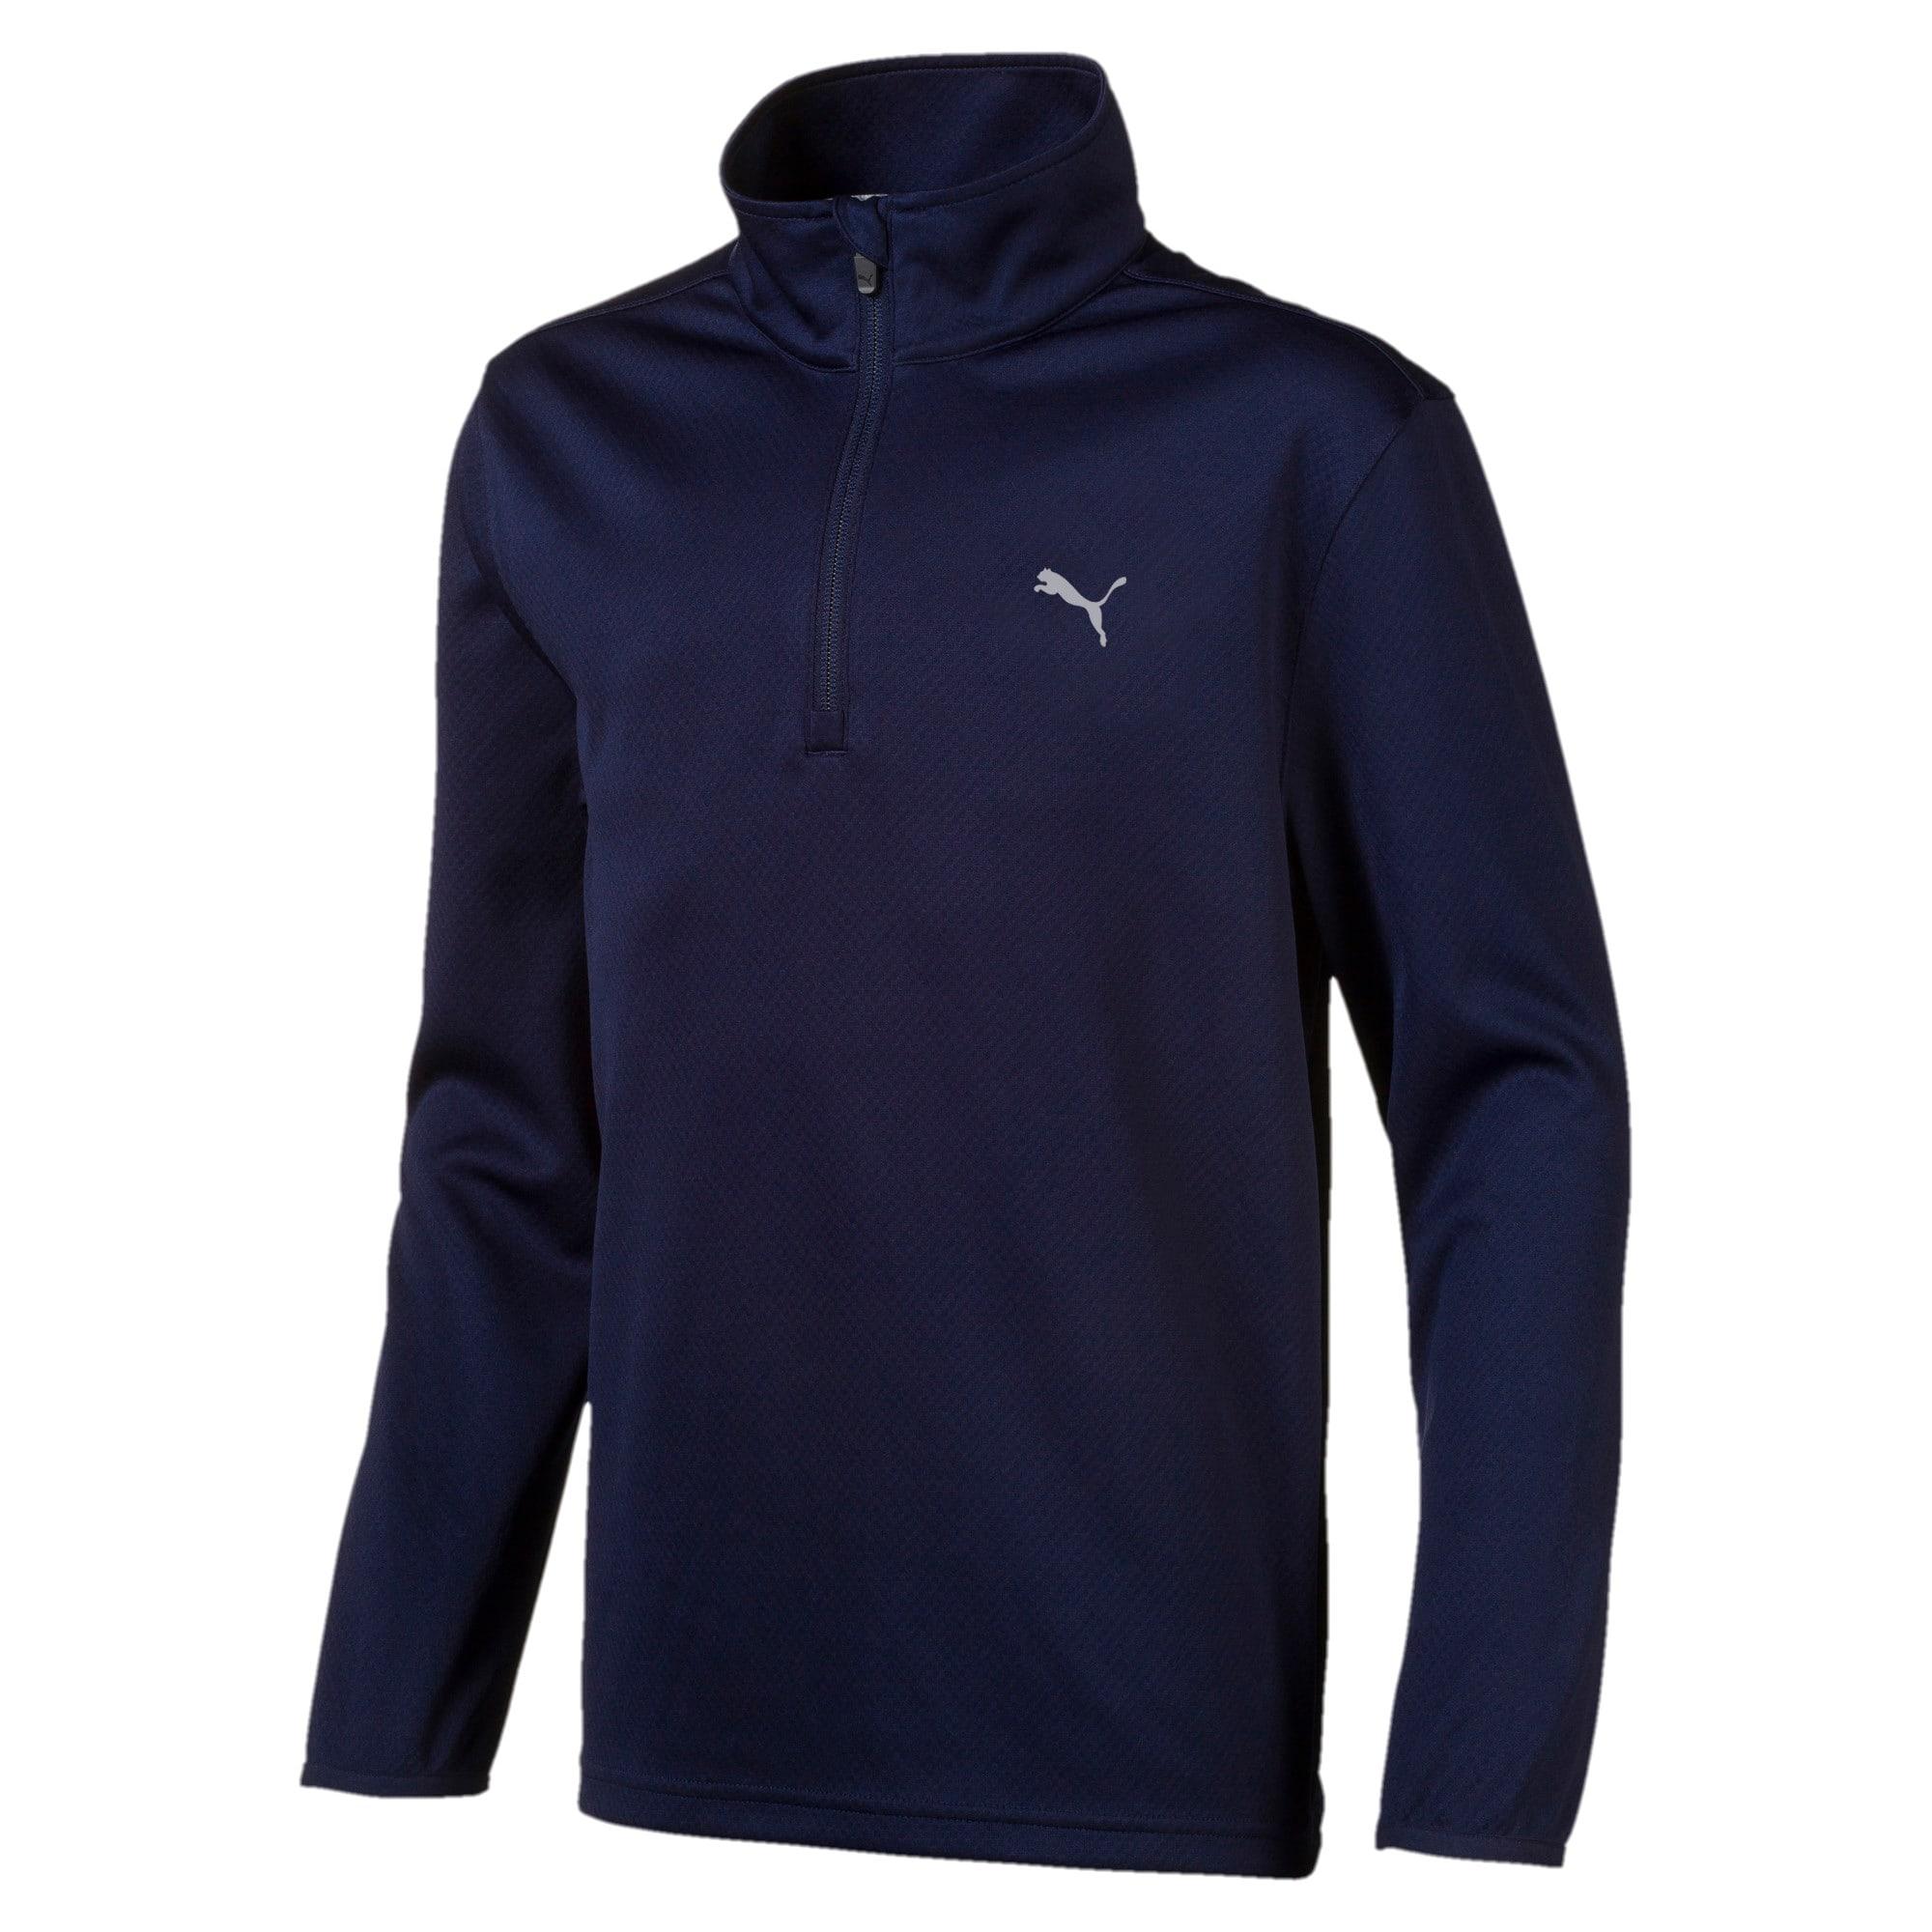 Thumbnail 1 of Quarter Zip Boys' Golf Pullover, Peacoat, medium